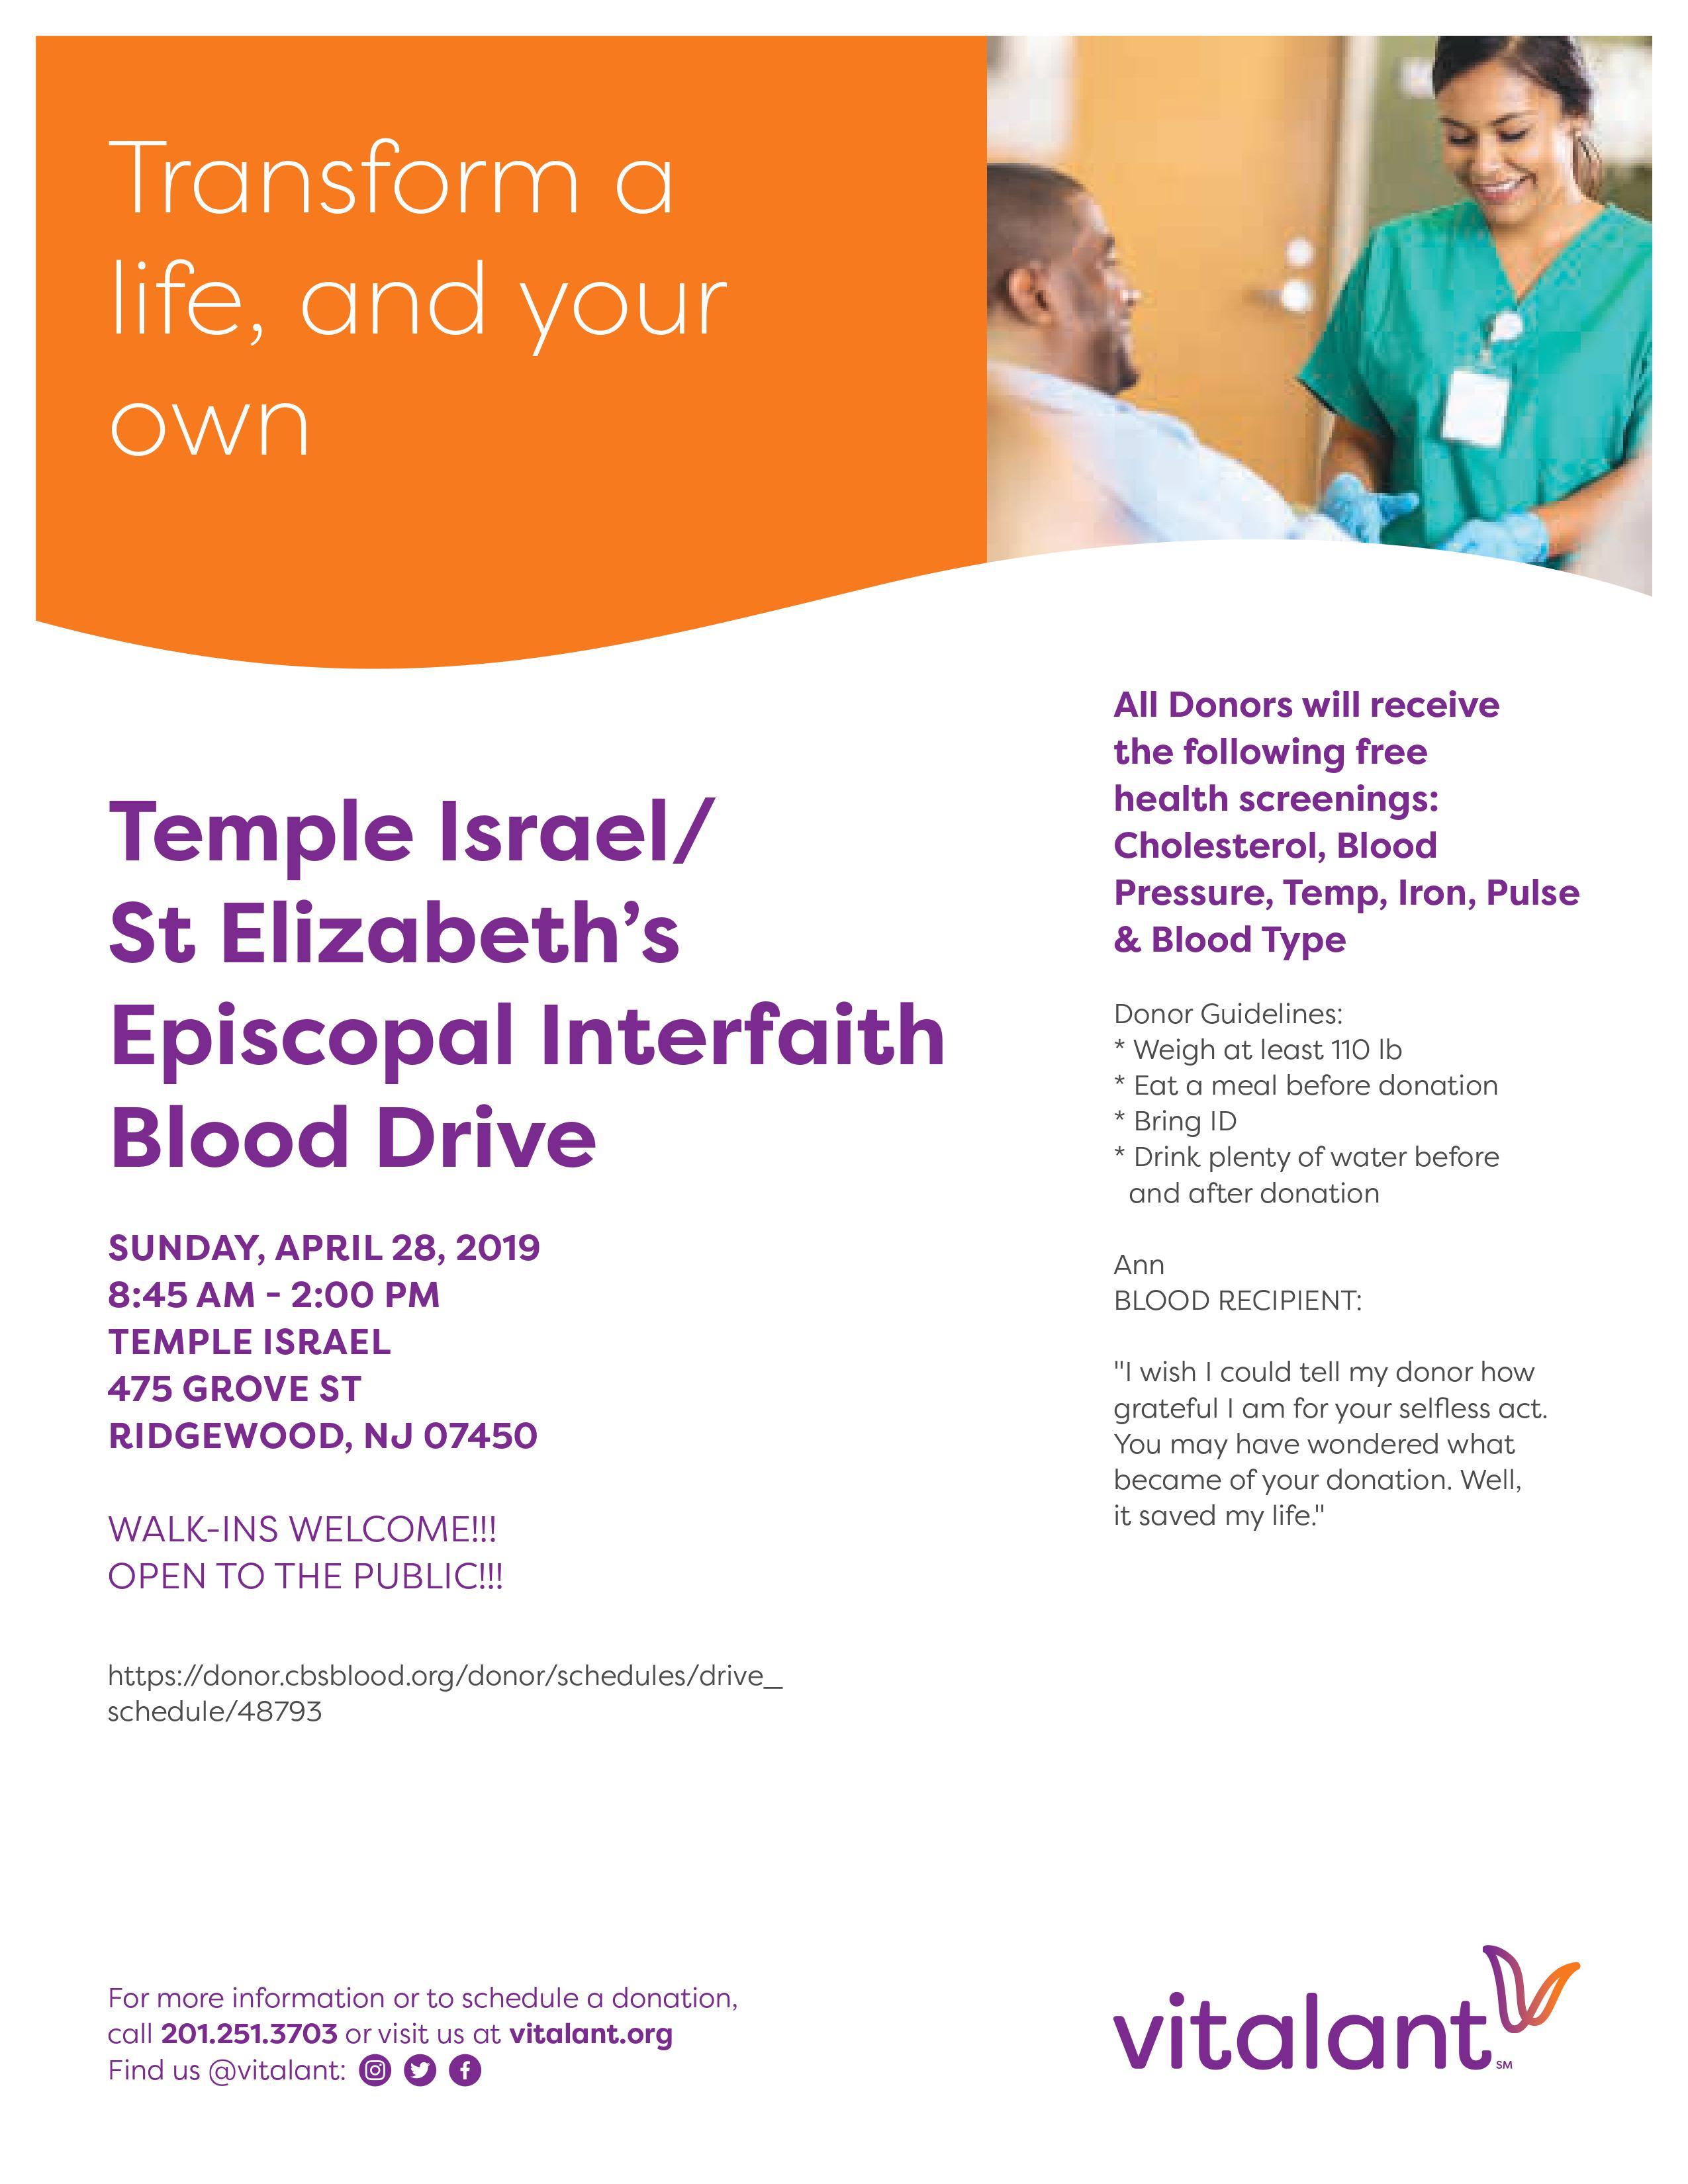 Interfaith blood drive